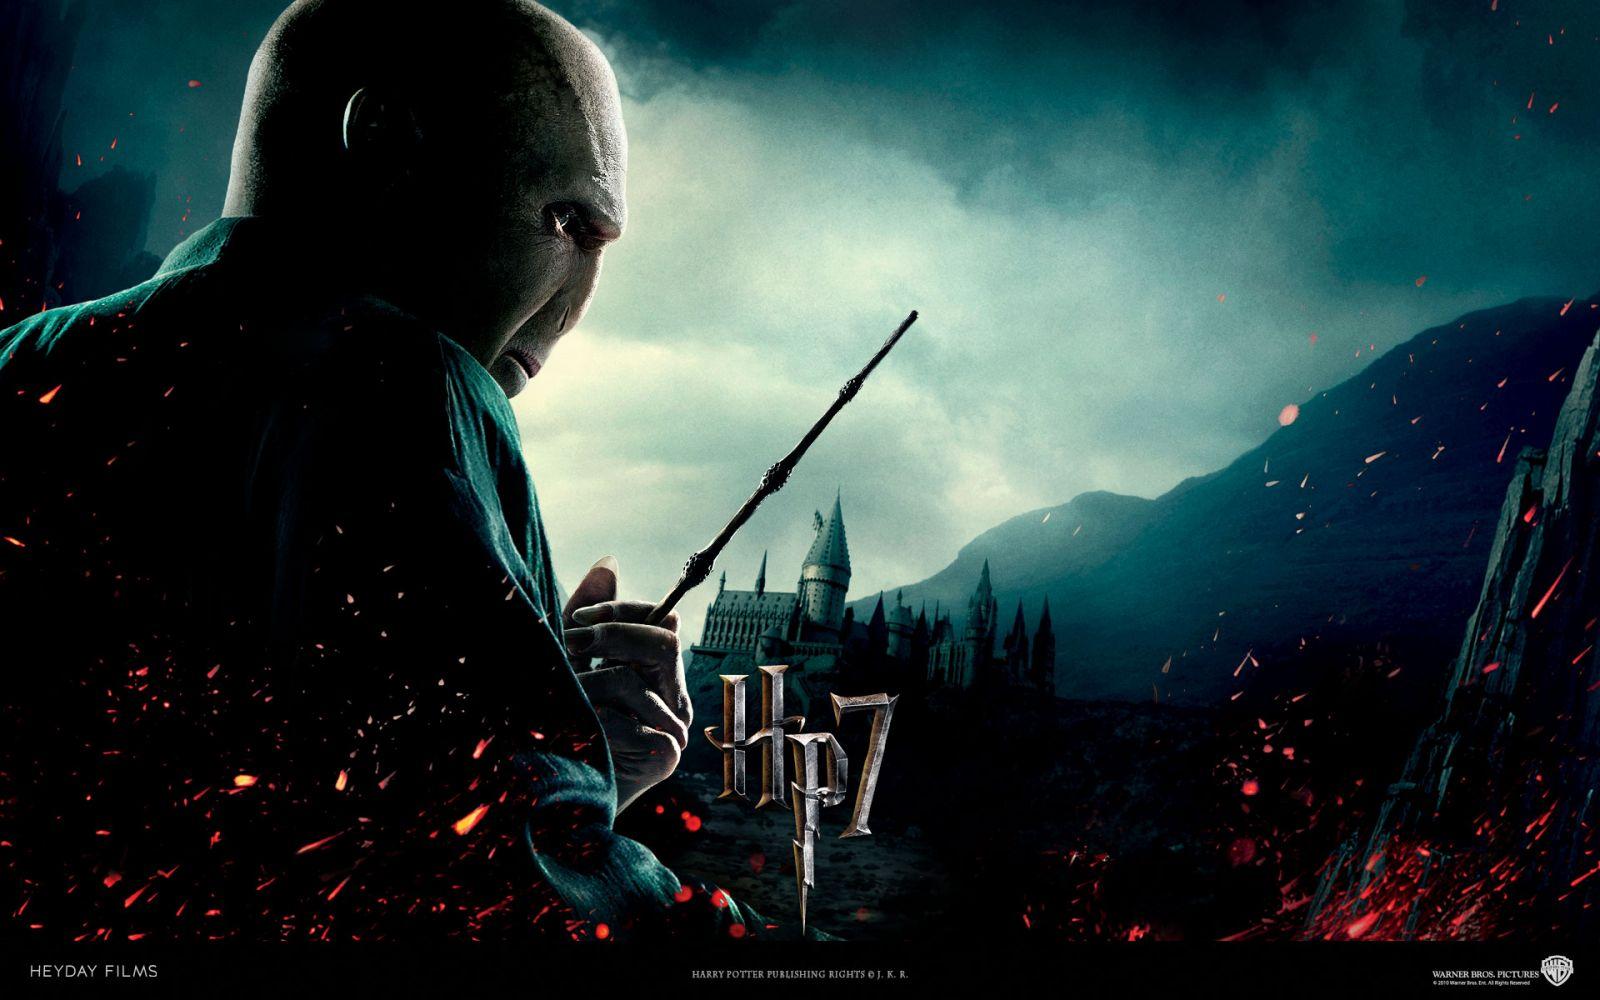 Más Wallpapers De Harry Potter 7 Parte 1 Imágenes Taringa